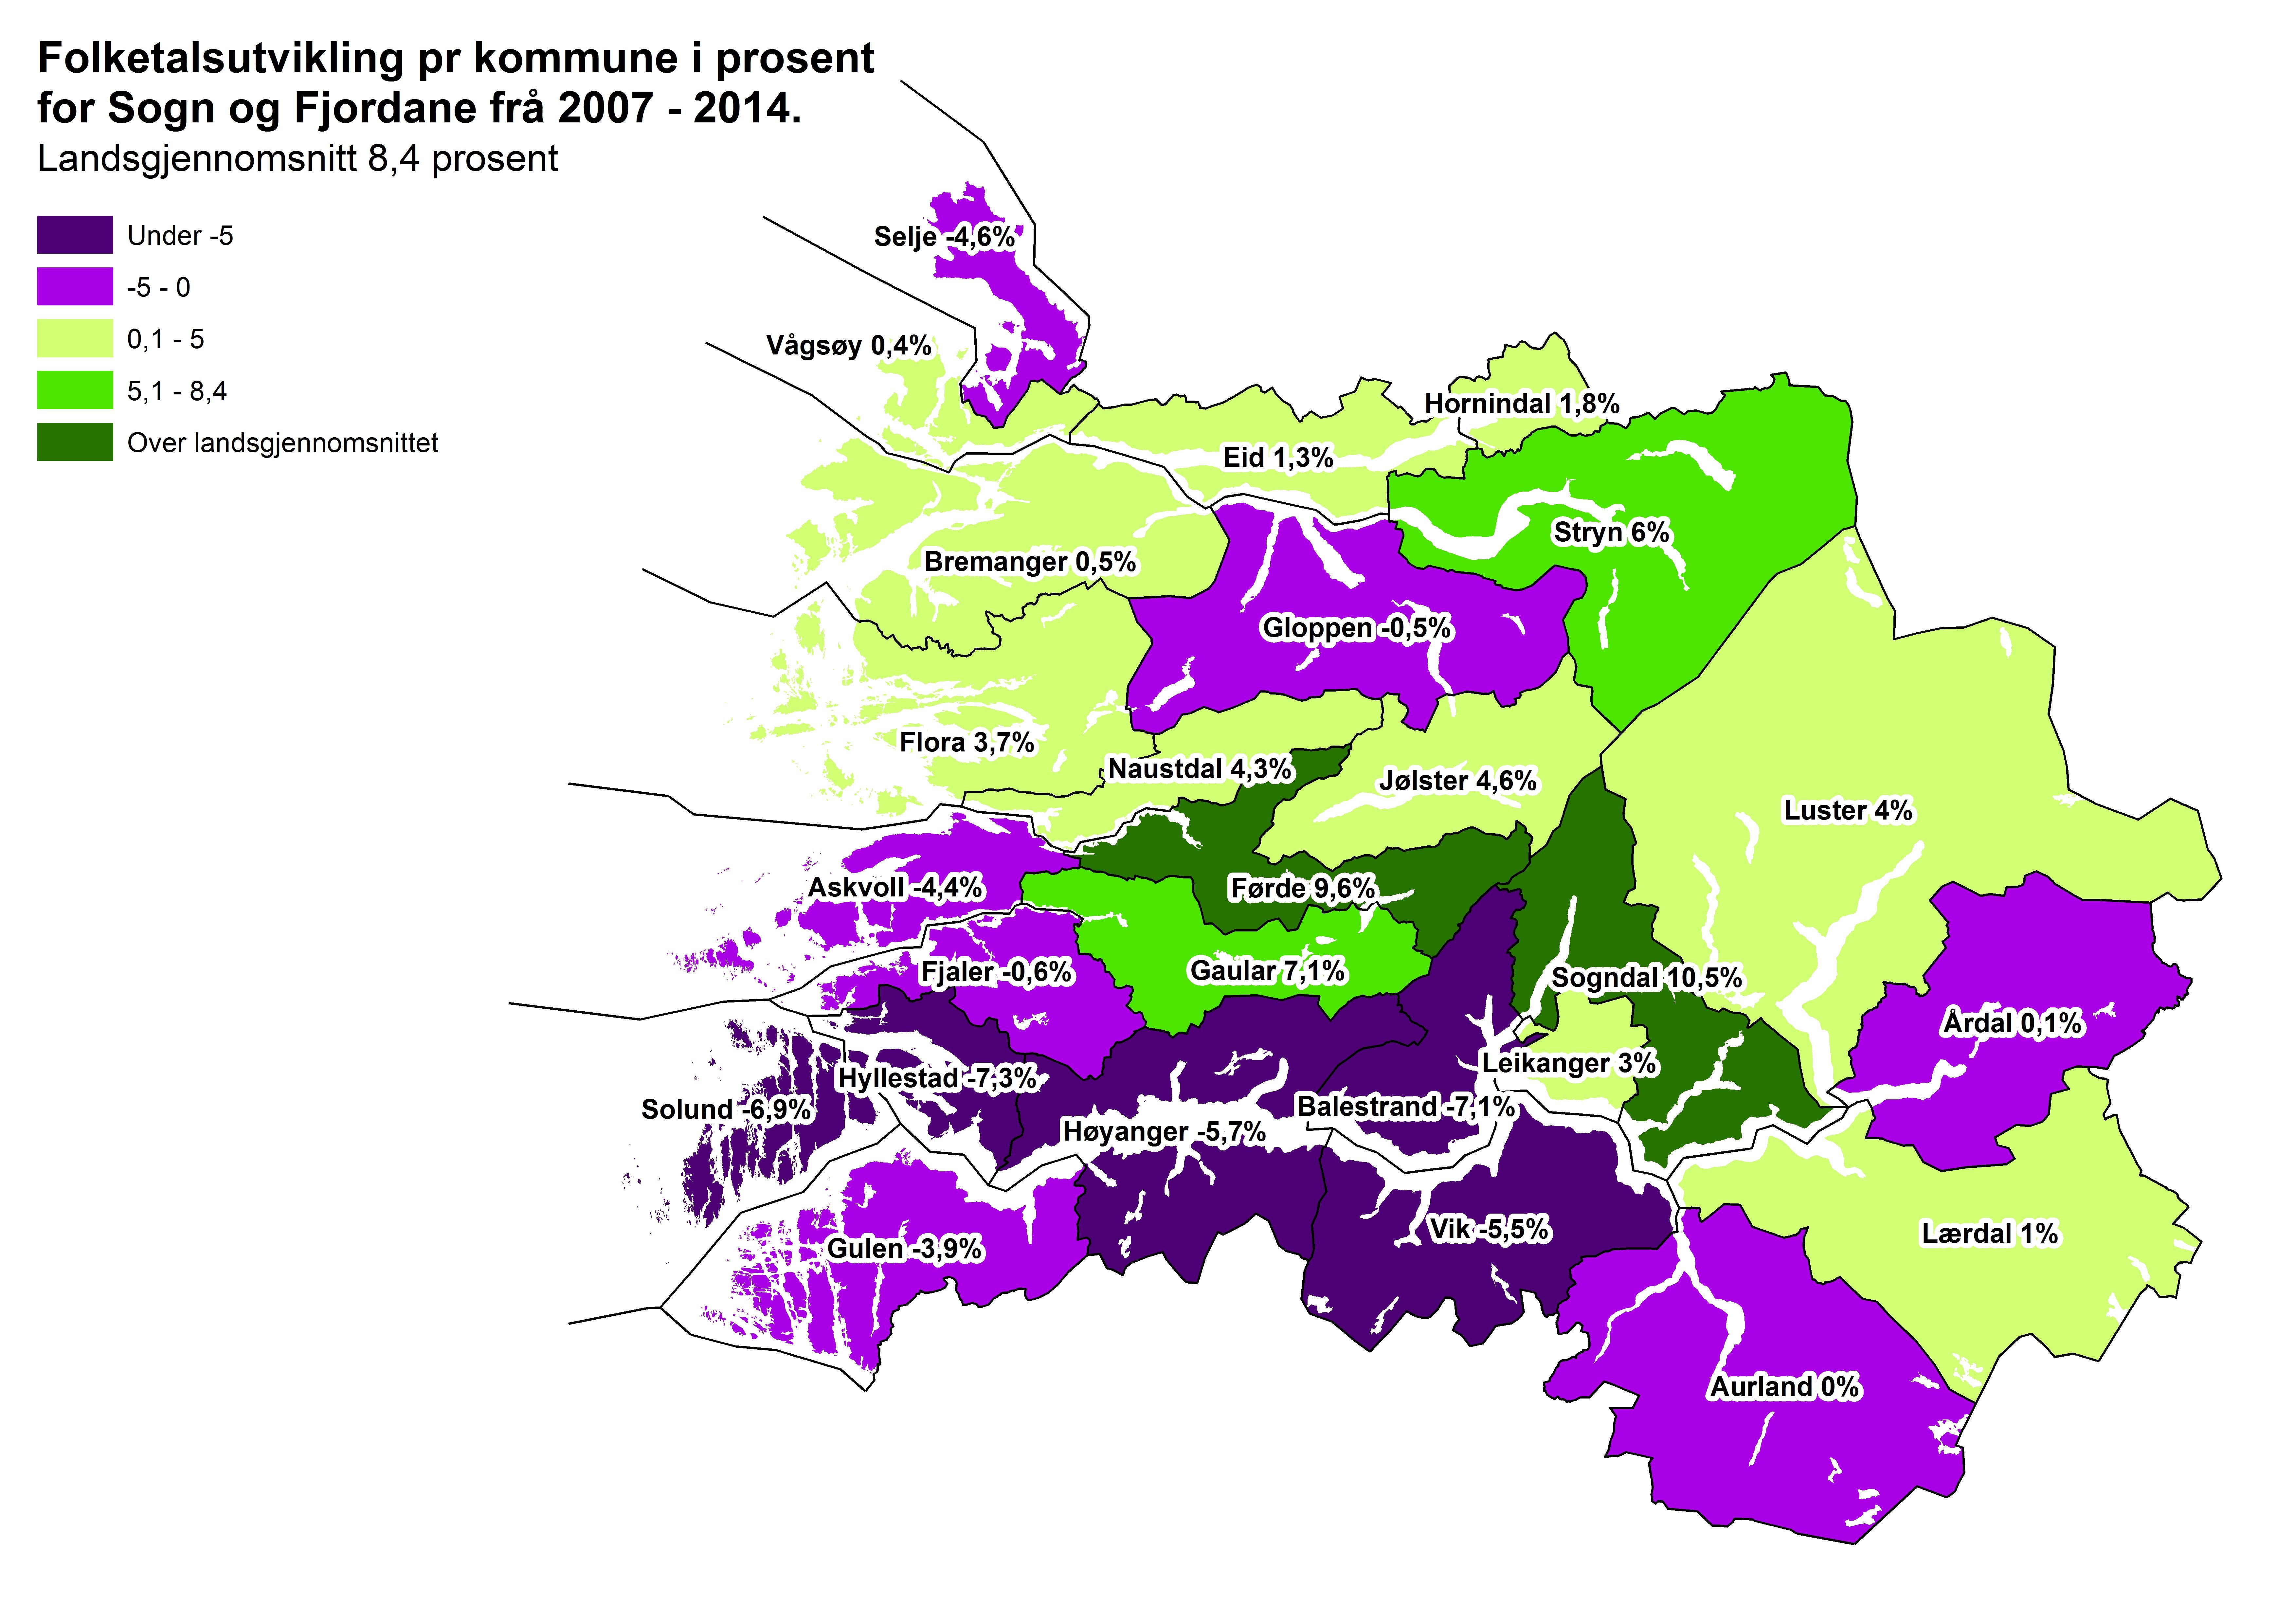 fjaler kart Folketalsutvikling   Sogn og Fjordane fylkeskommune fjaler kart